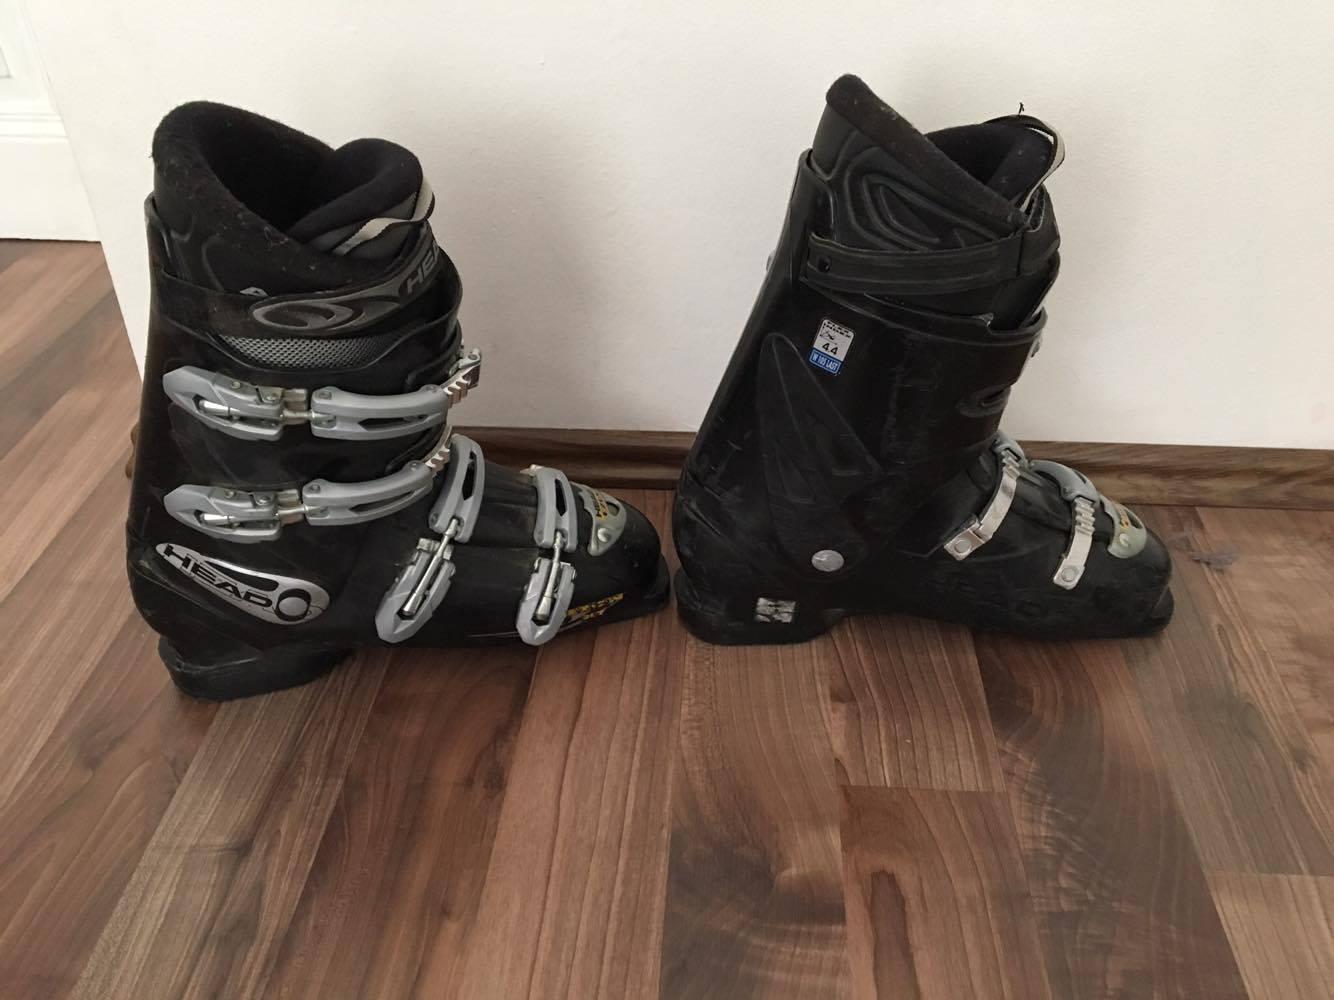 Lyžařské boty HEAD Ezon 8.0 - Bazar - SNOW.CZ 558bd2723c